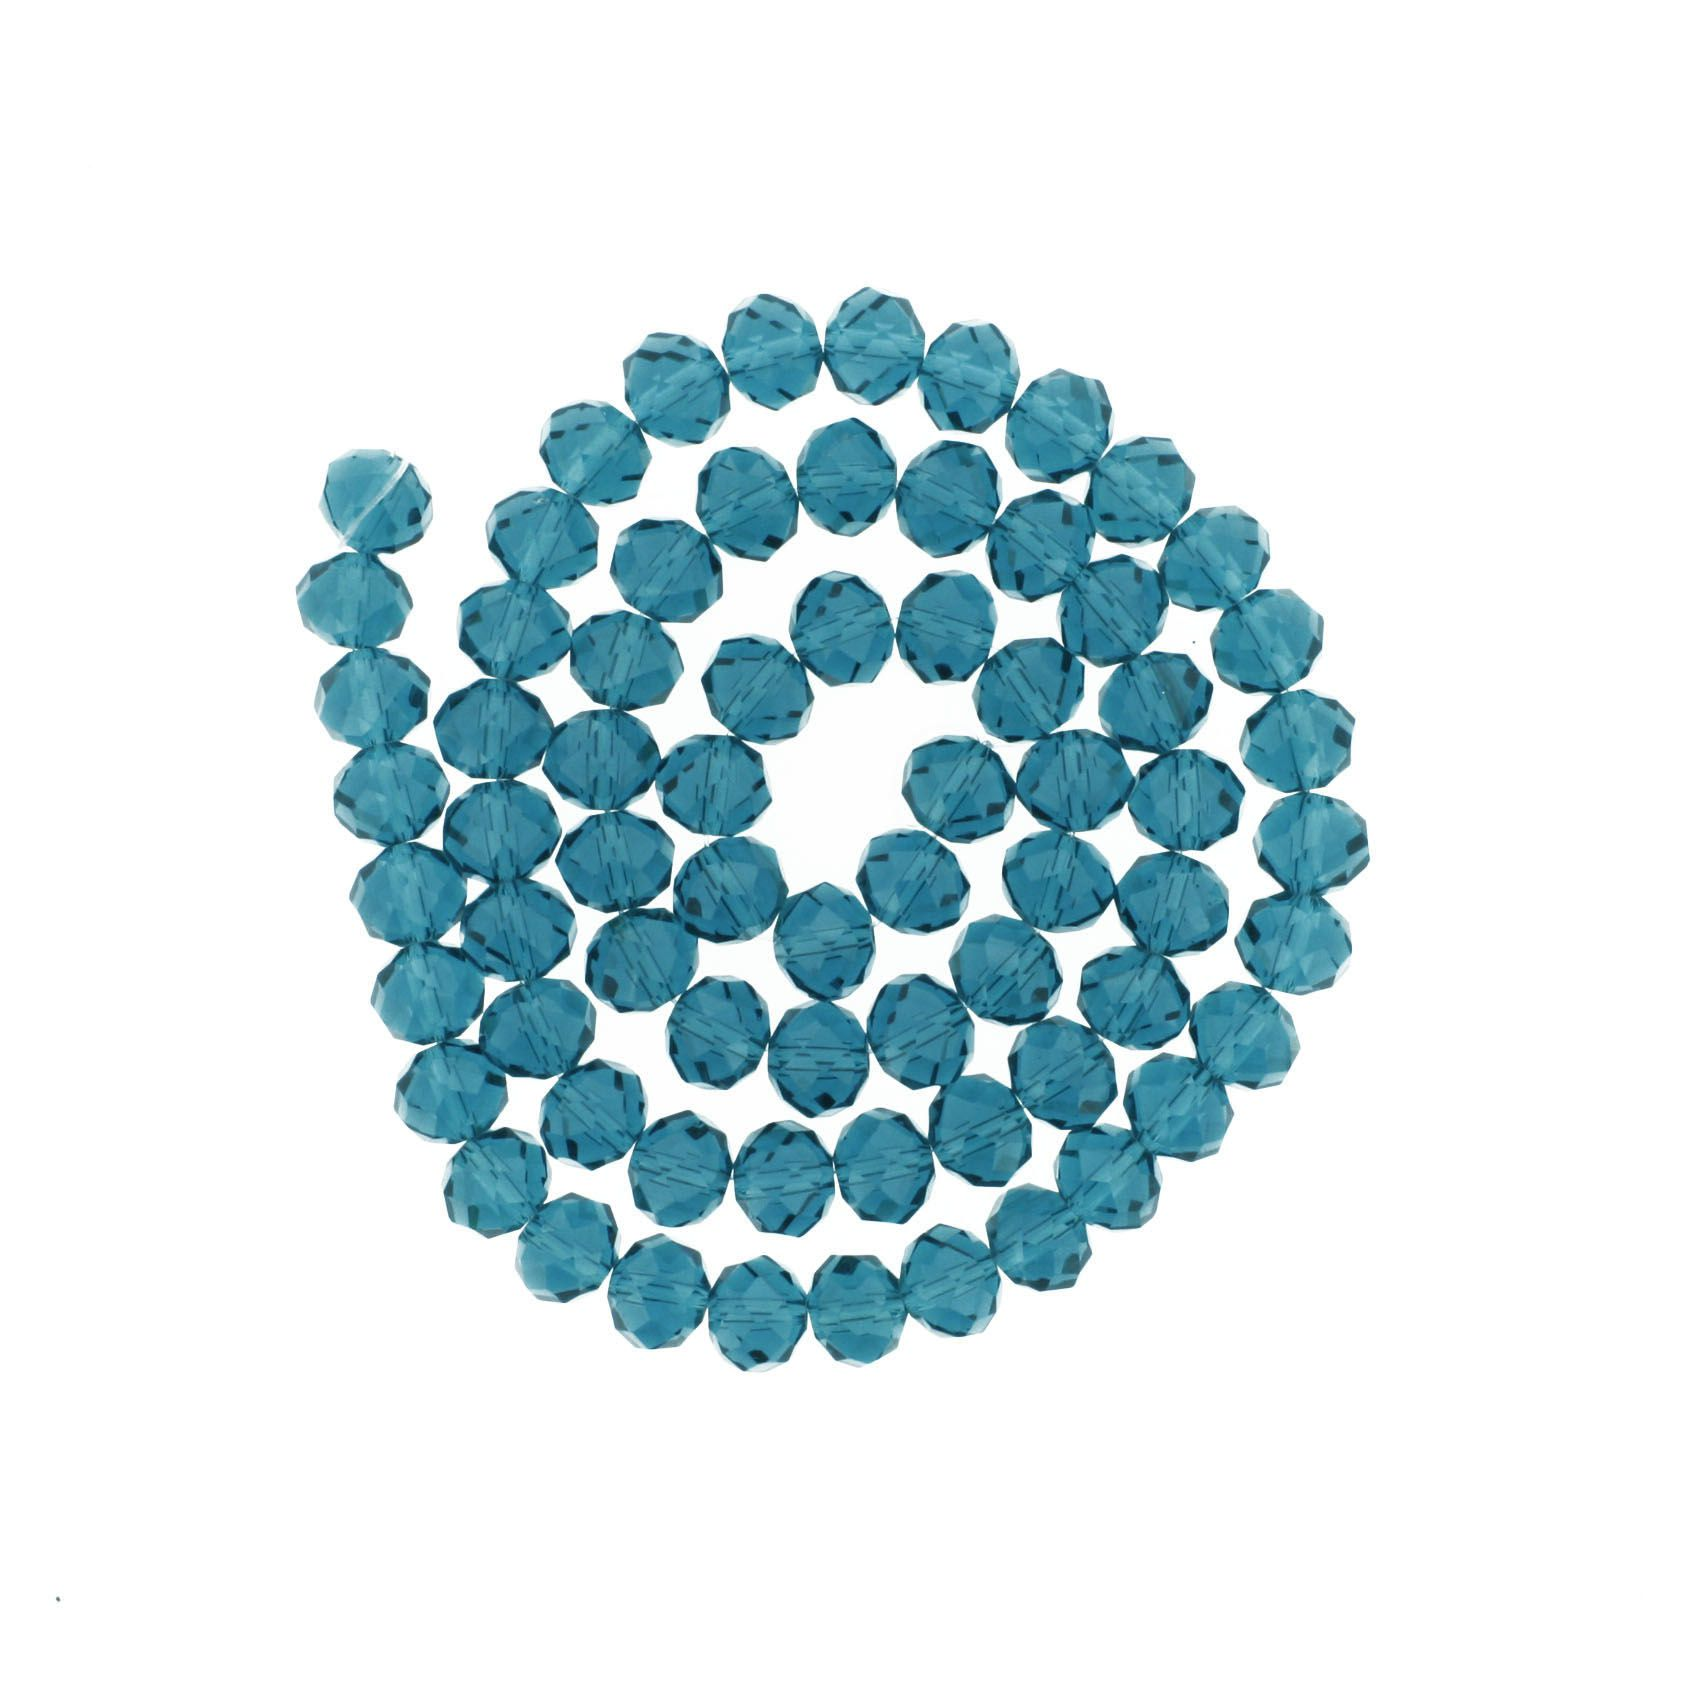 Fio de Cristal - Flat® - Azul Petróleo - 10mm  - Stéphanie Bijoux® - Peças para Bijuterias e Artesanato